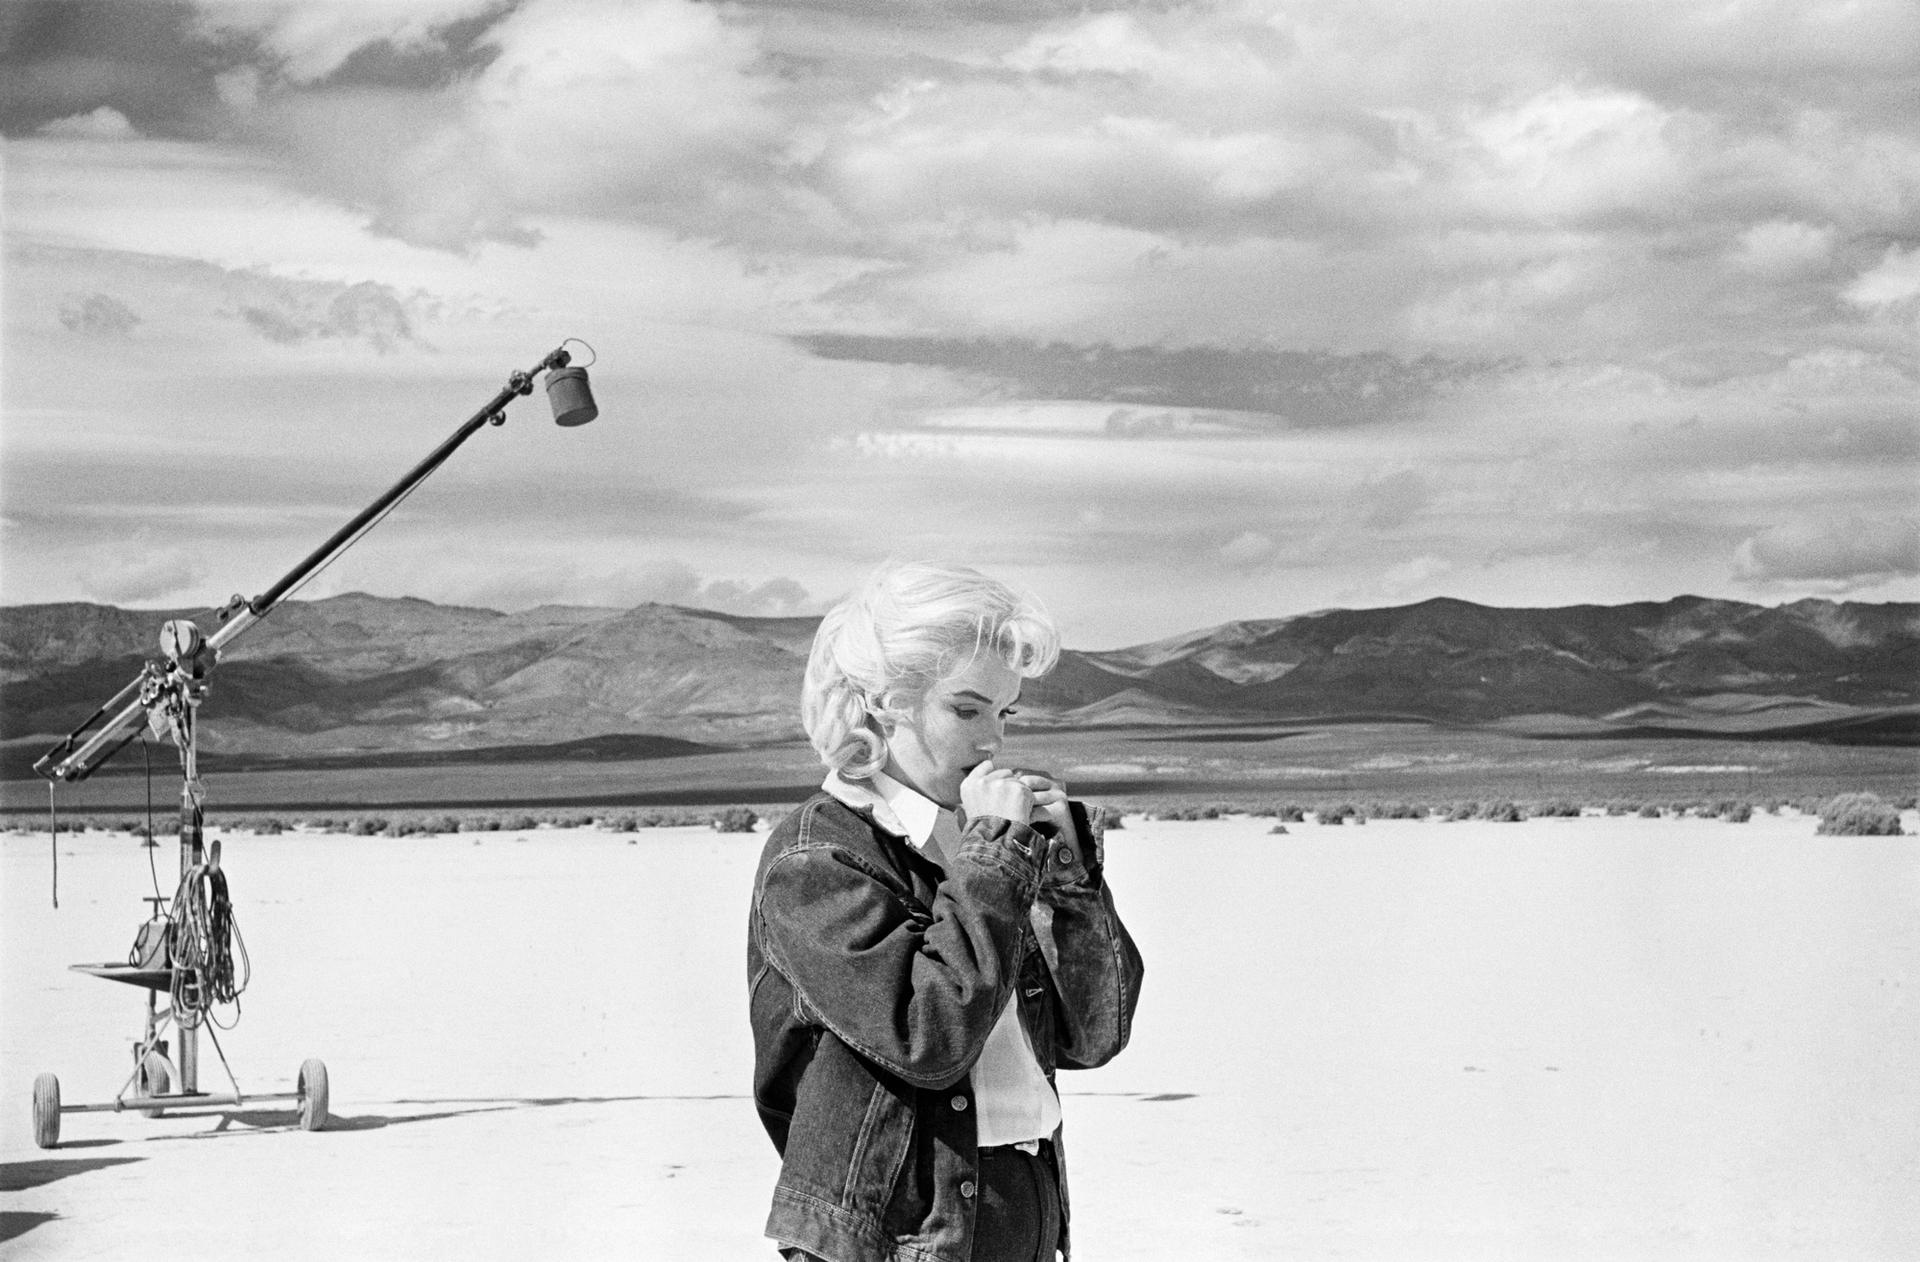 Marilyn Monroe on the set of The Misfits, Eve Arnold (1961) courtesy Eve Arnold Estate